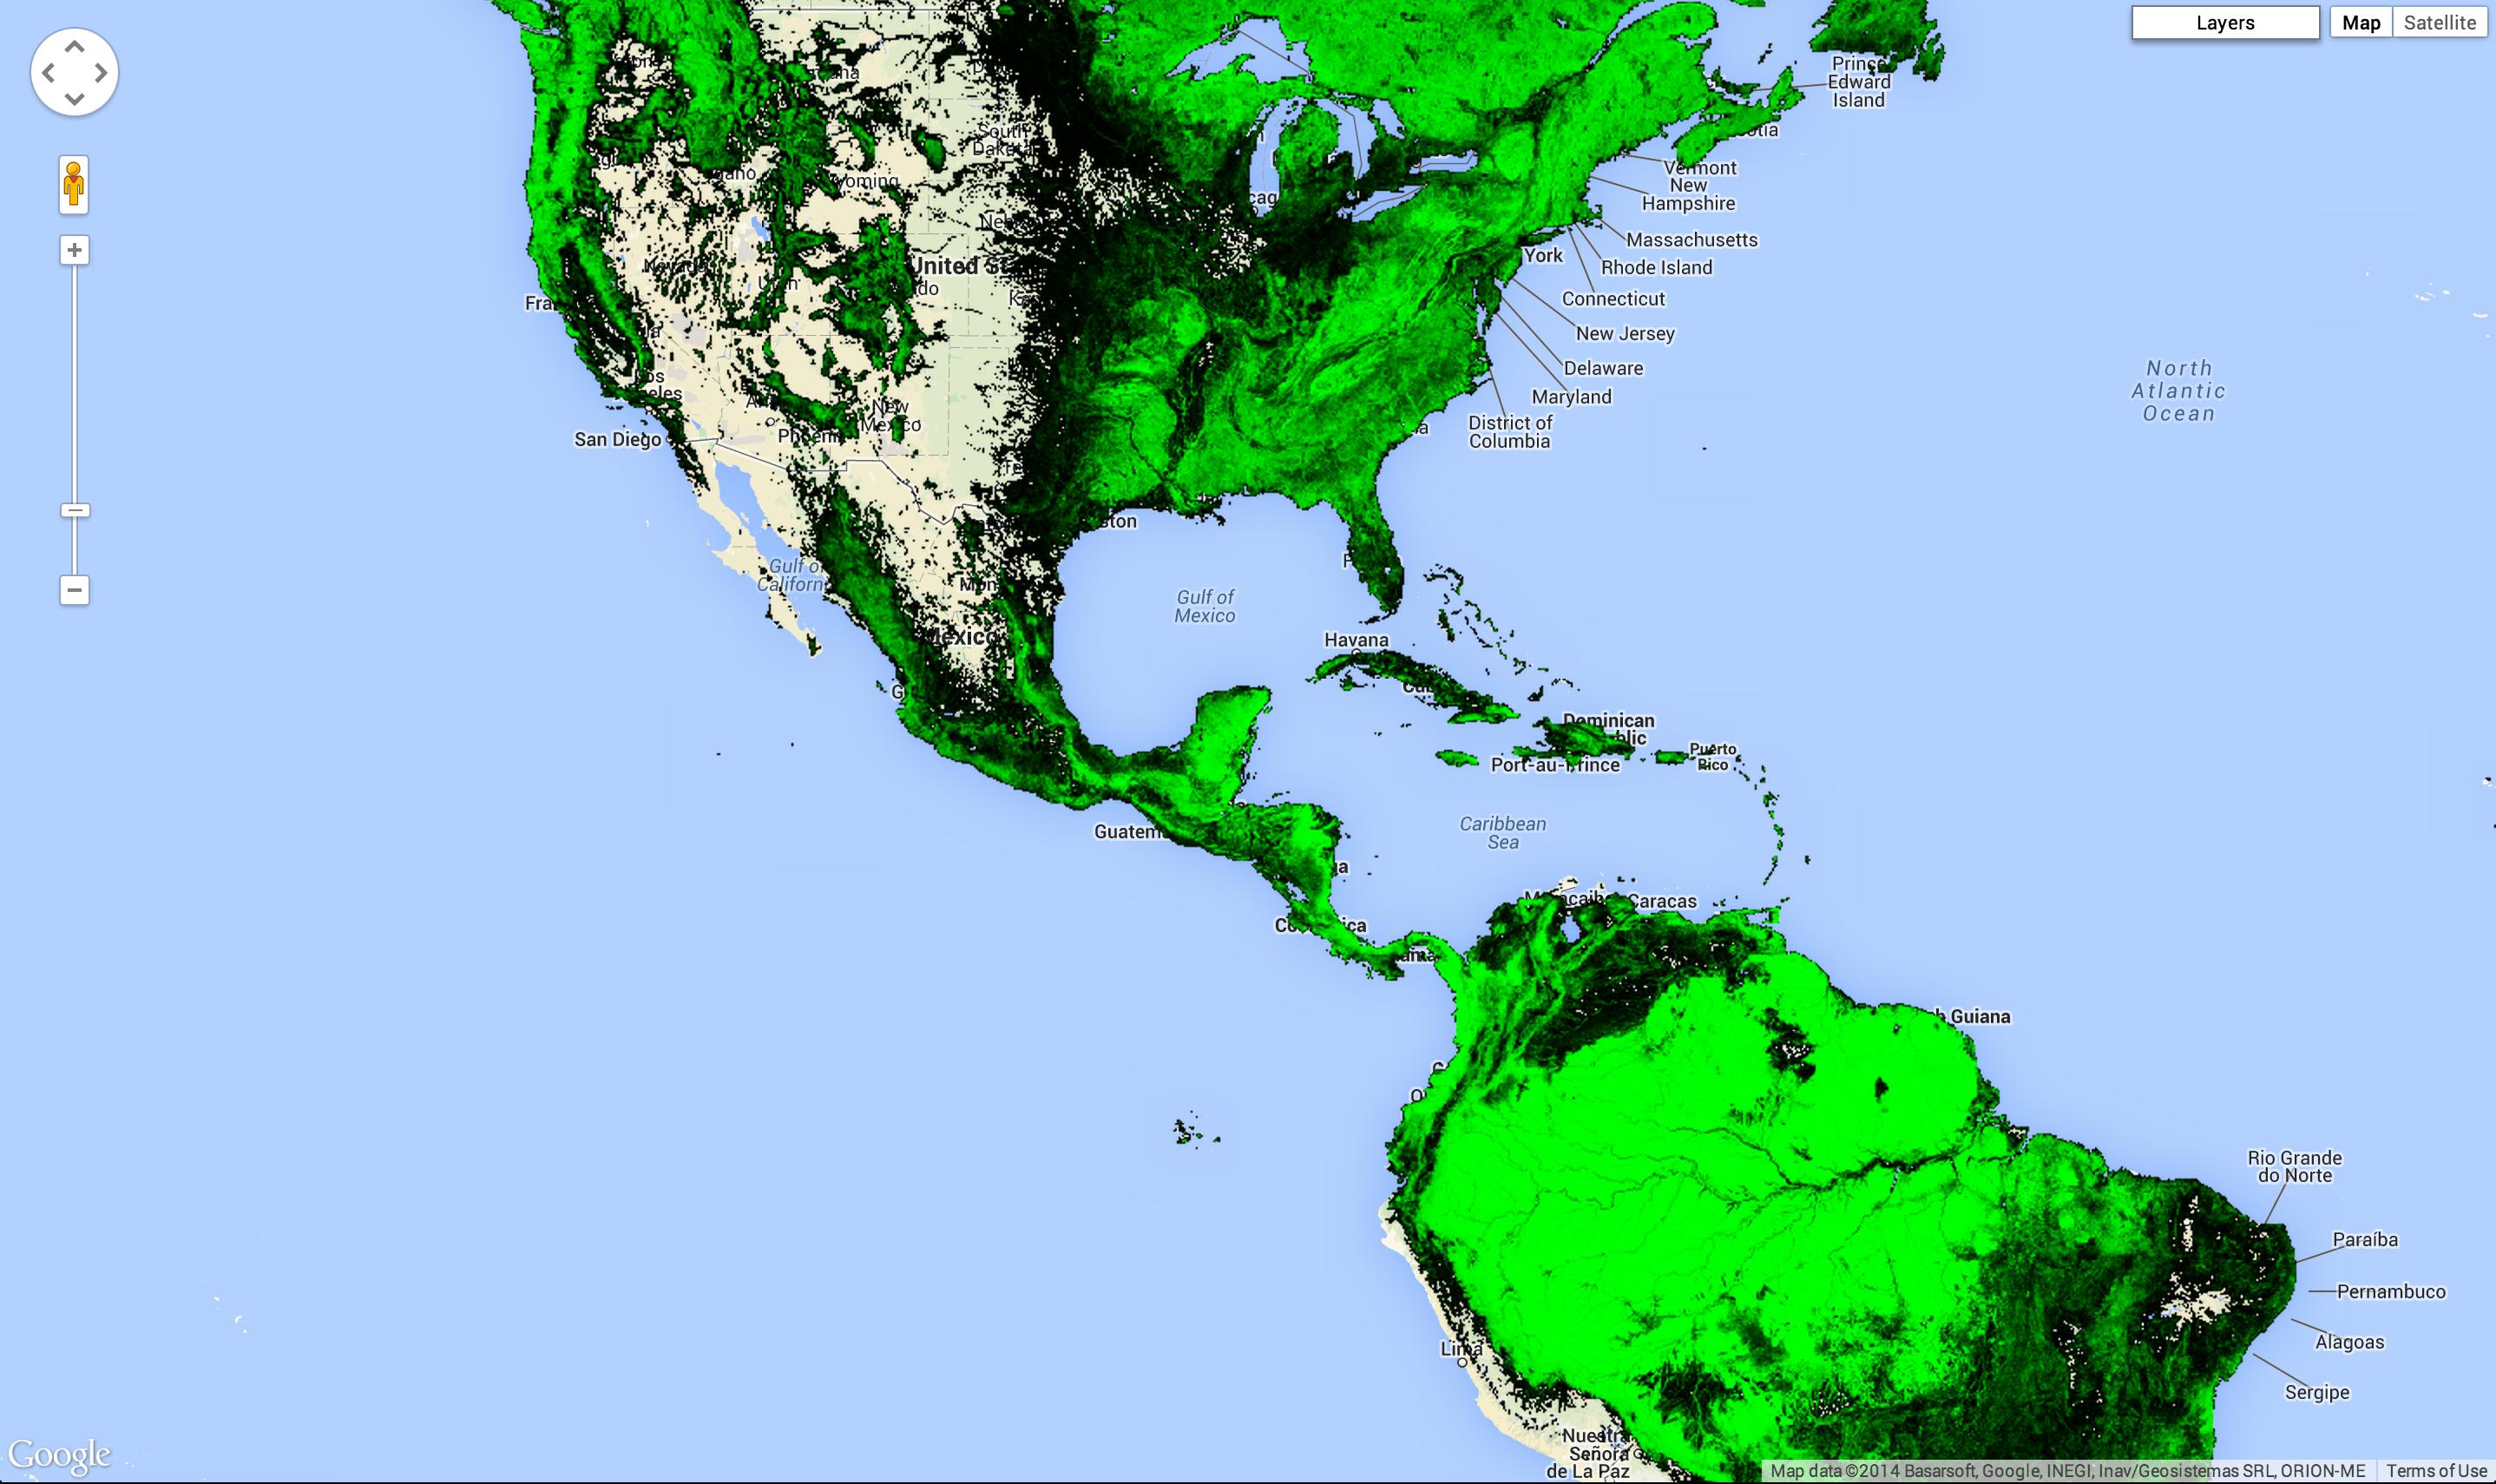 Americas treecover